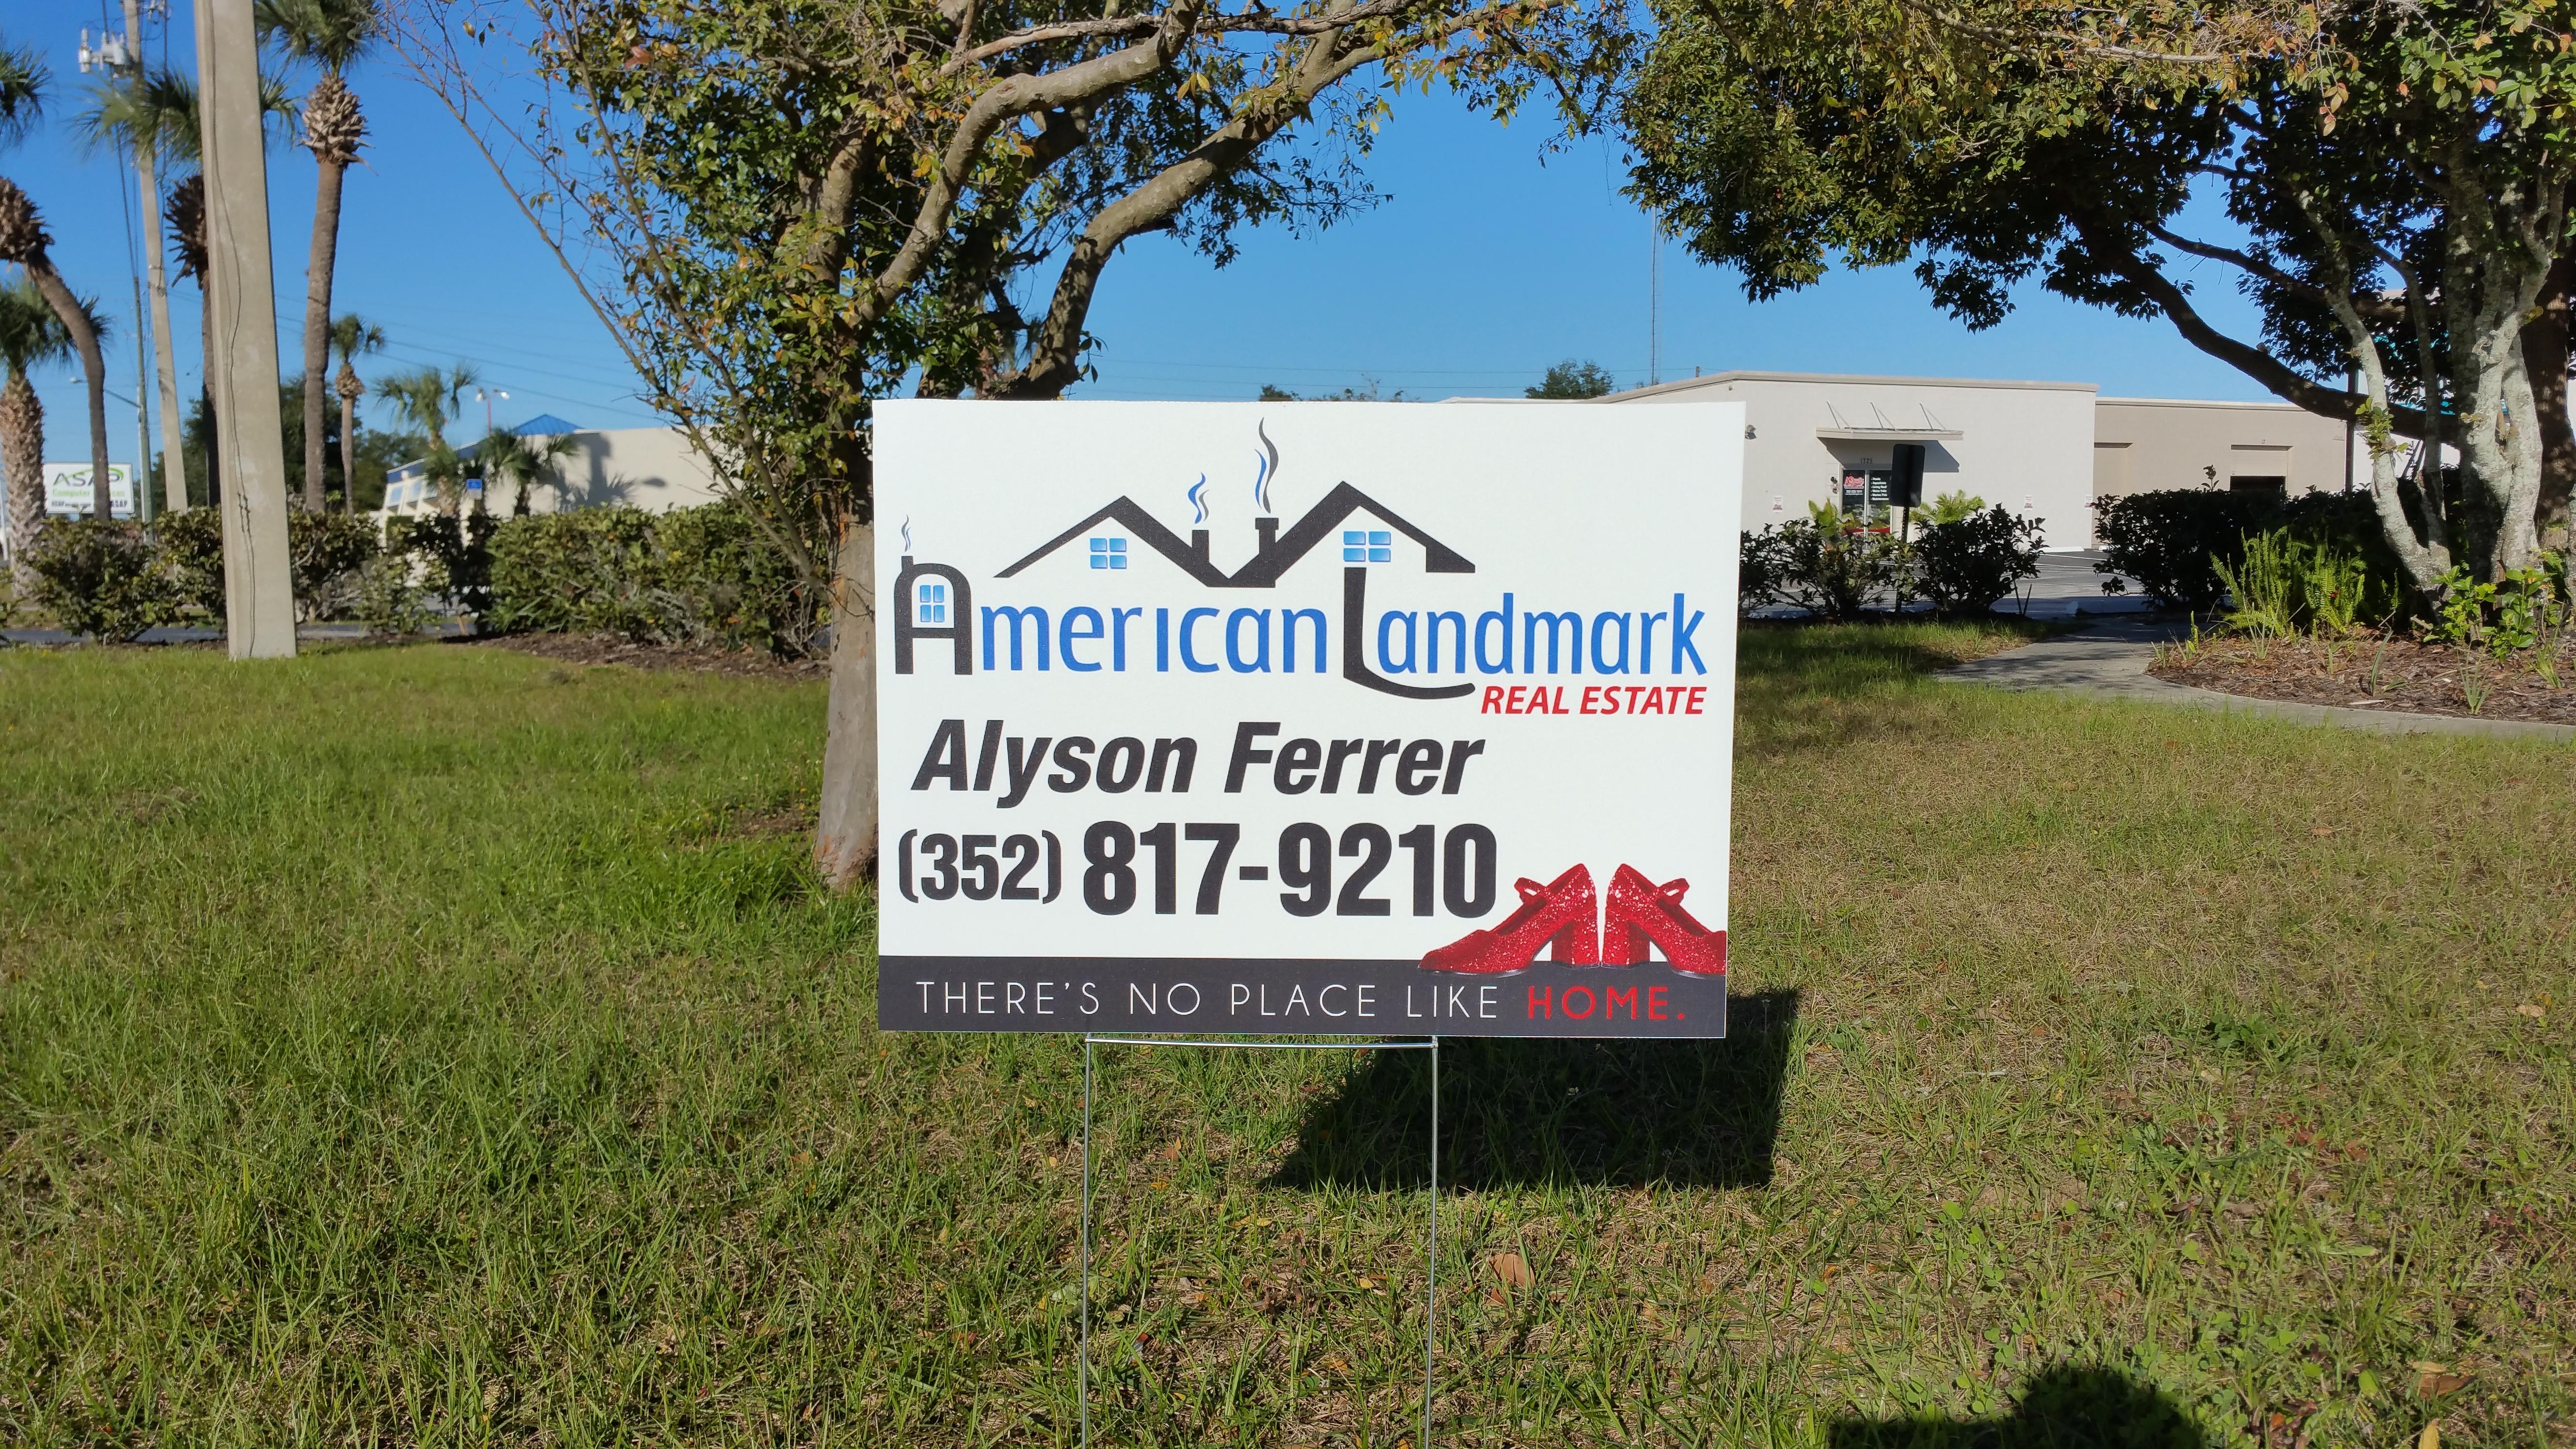 Yard Signs Lawn Signs